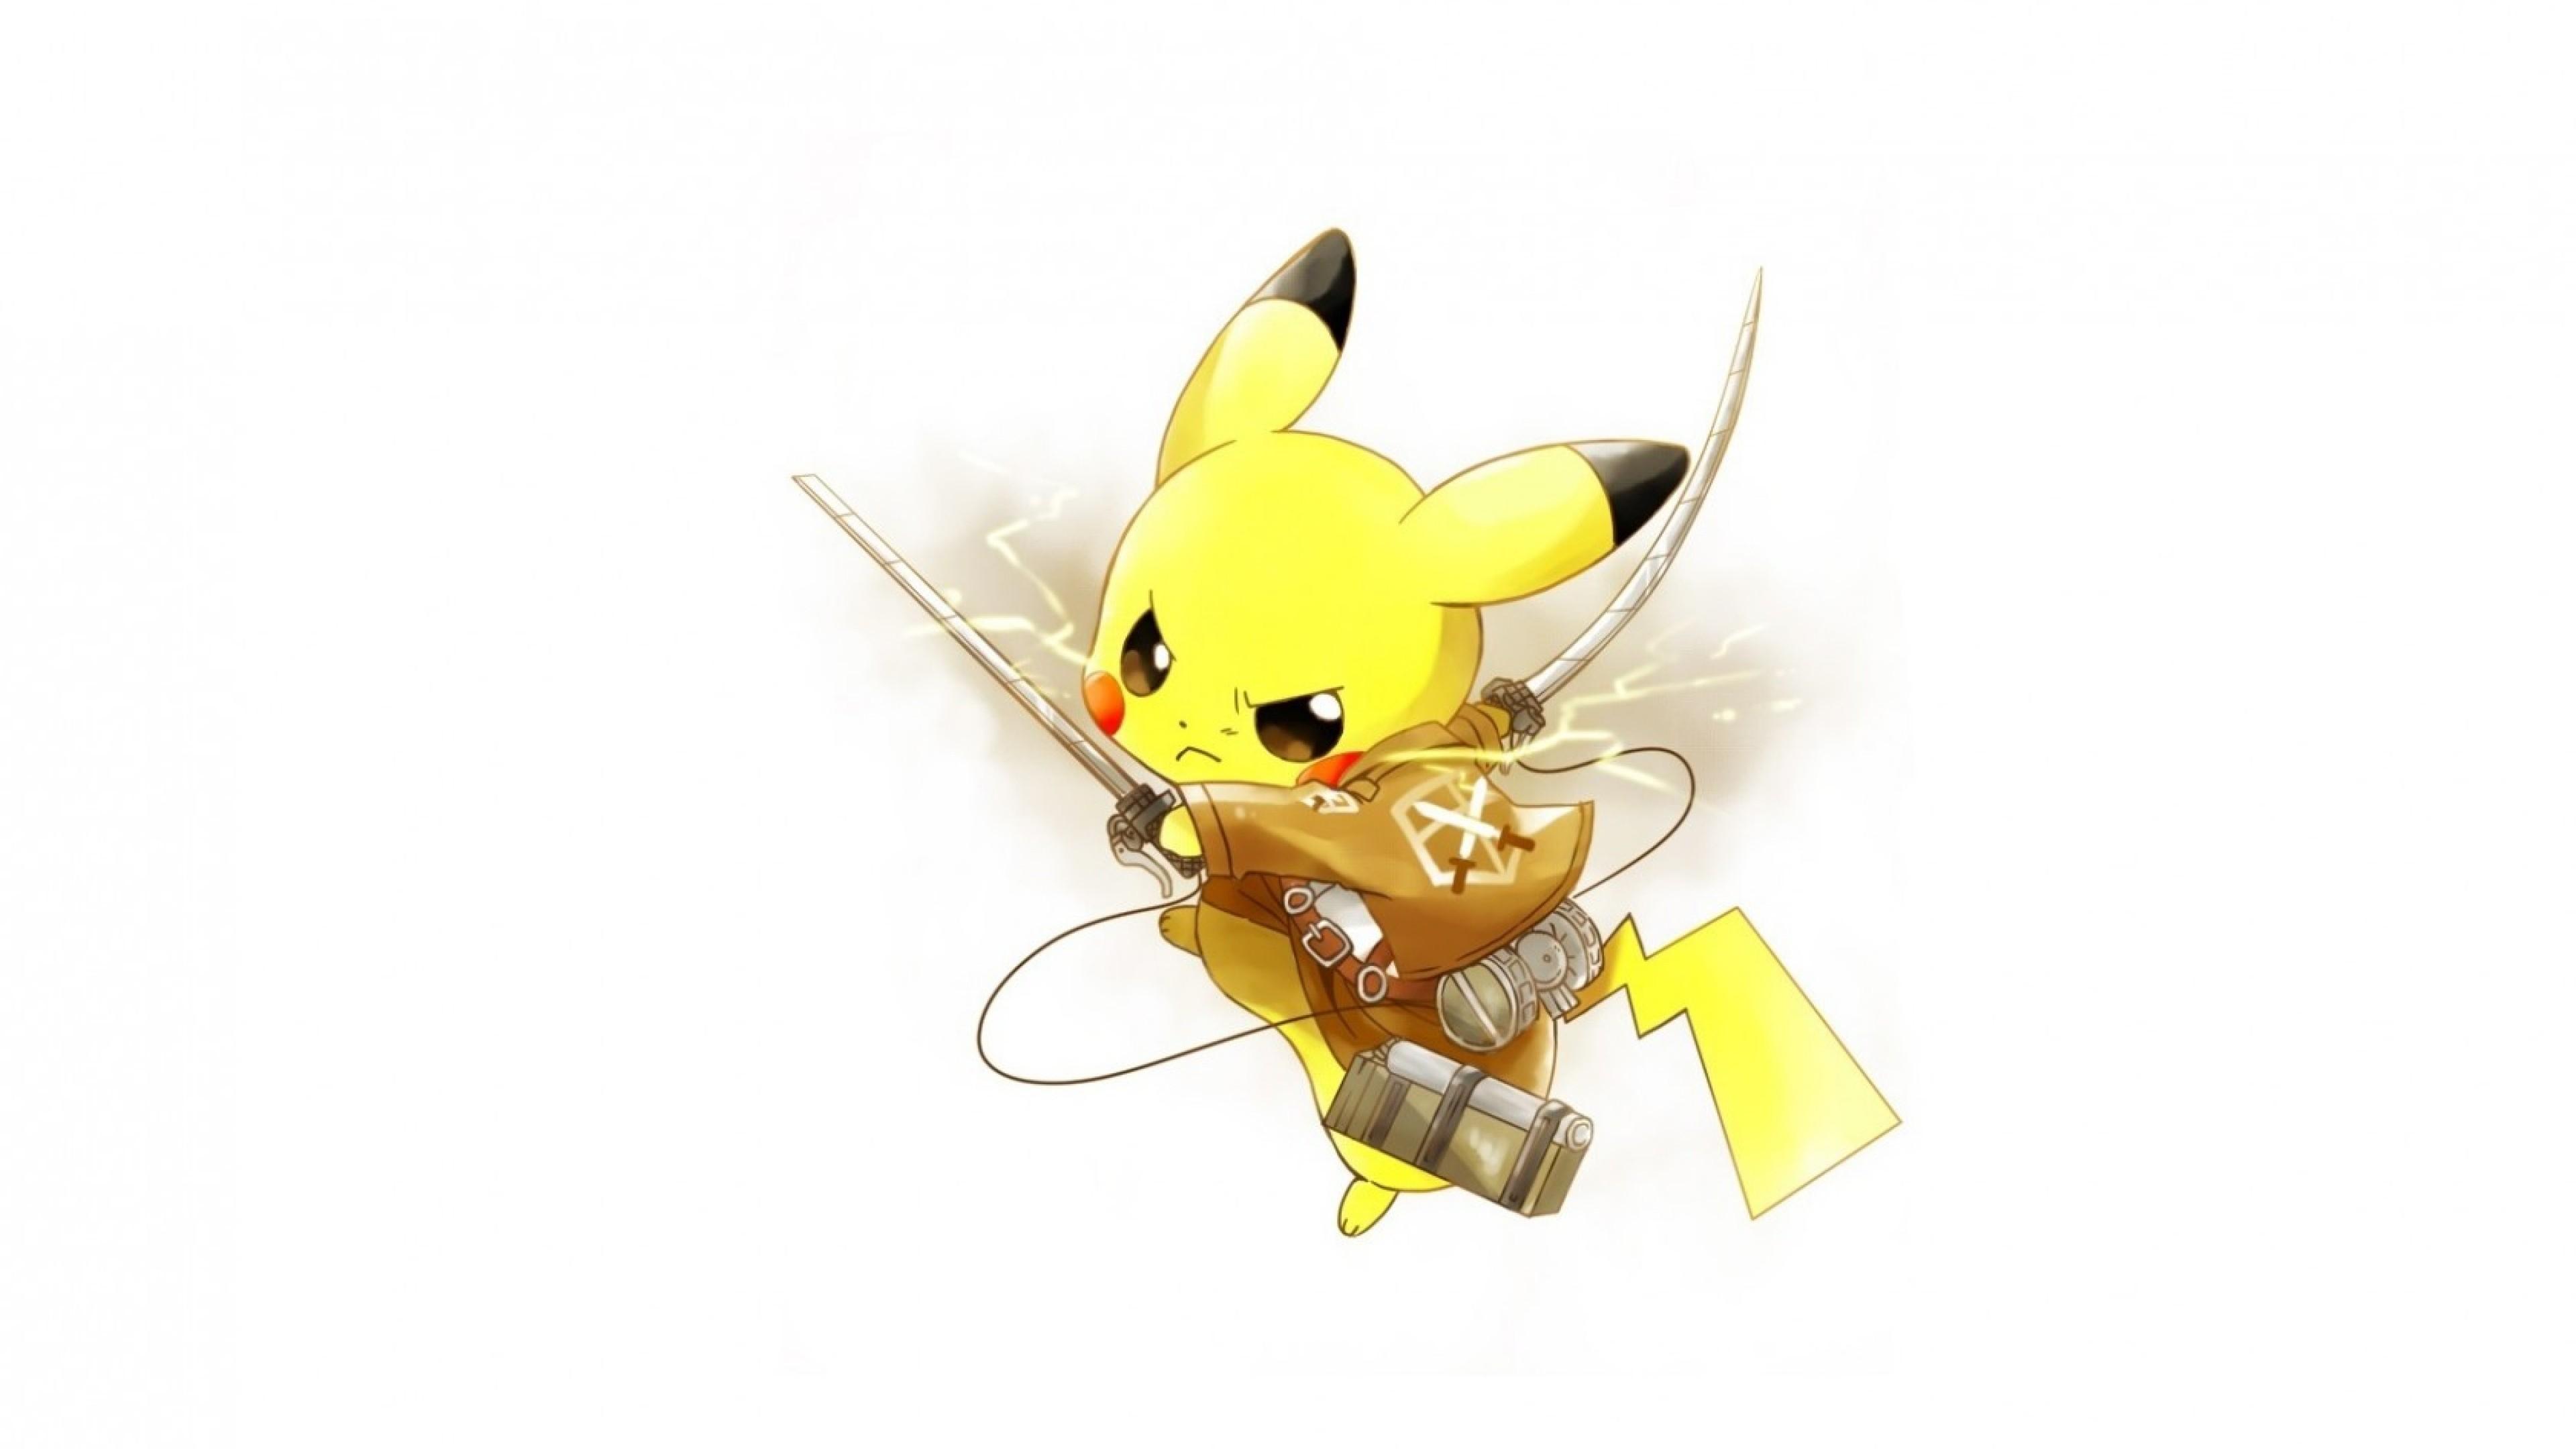 Wallpaper attack of the titans, pokemon, pikachu, art